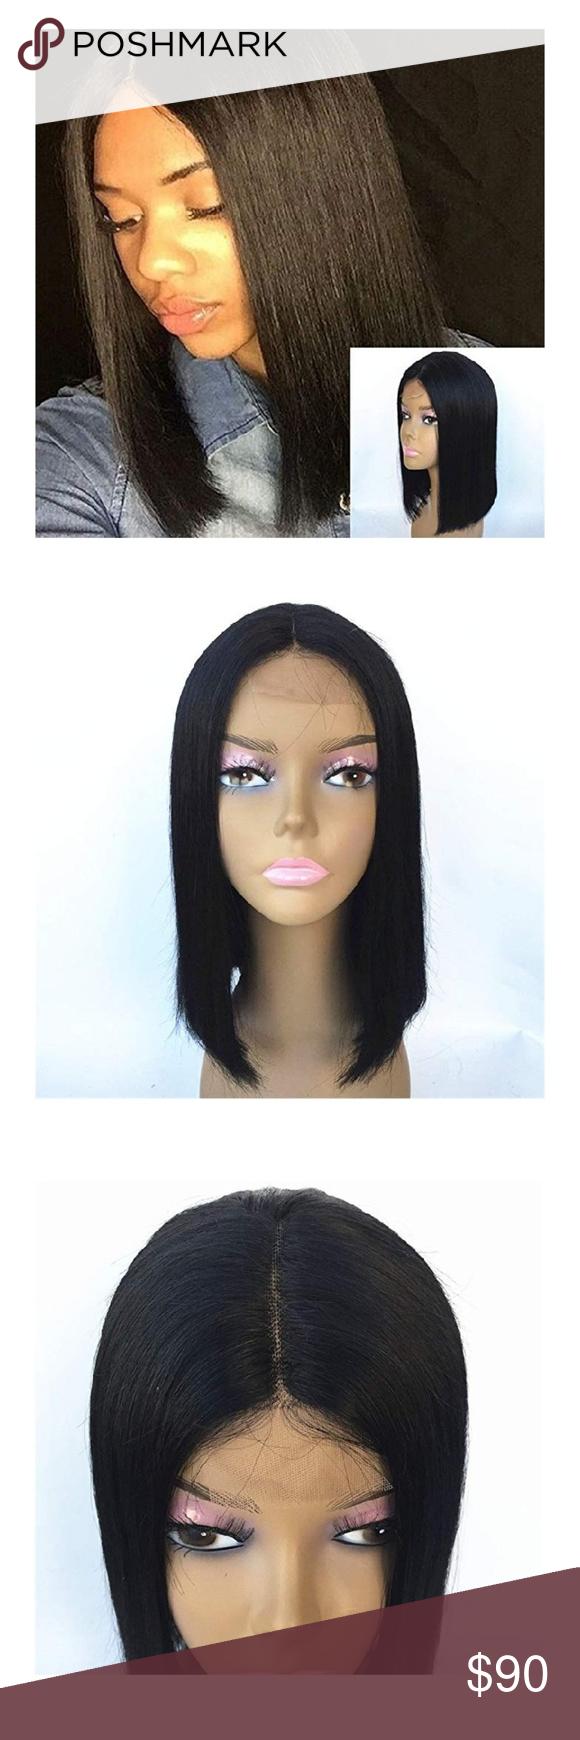 fcb73d0e2 JYL Brazilian Virgin Straight Shoulder Length Wig JYL Hair Brazilian Virgin Straight  Shoulder Length Short Bob